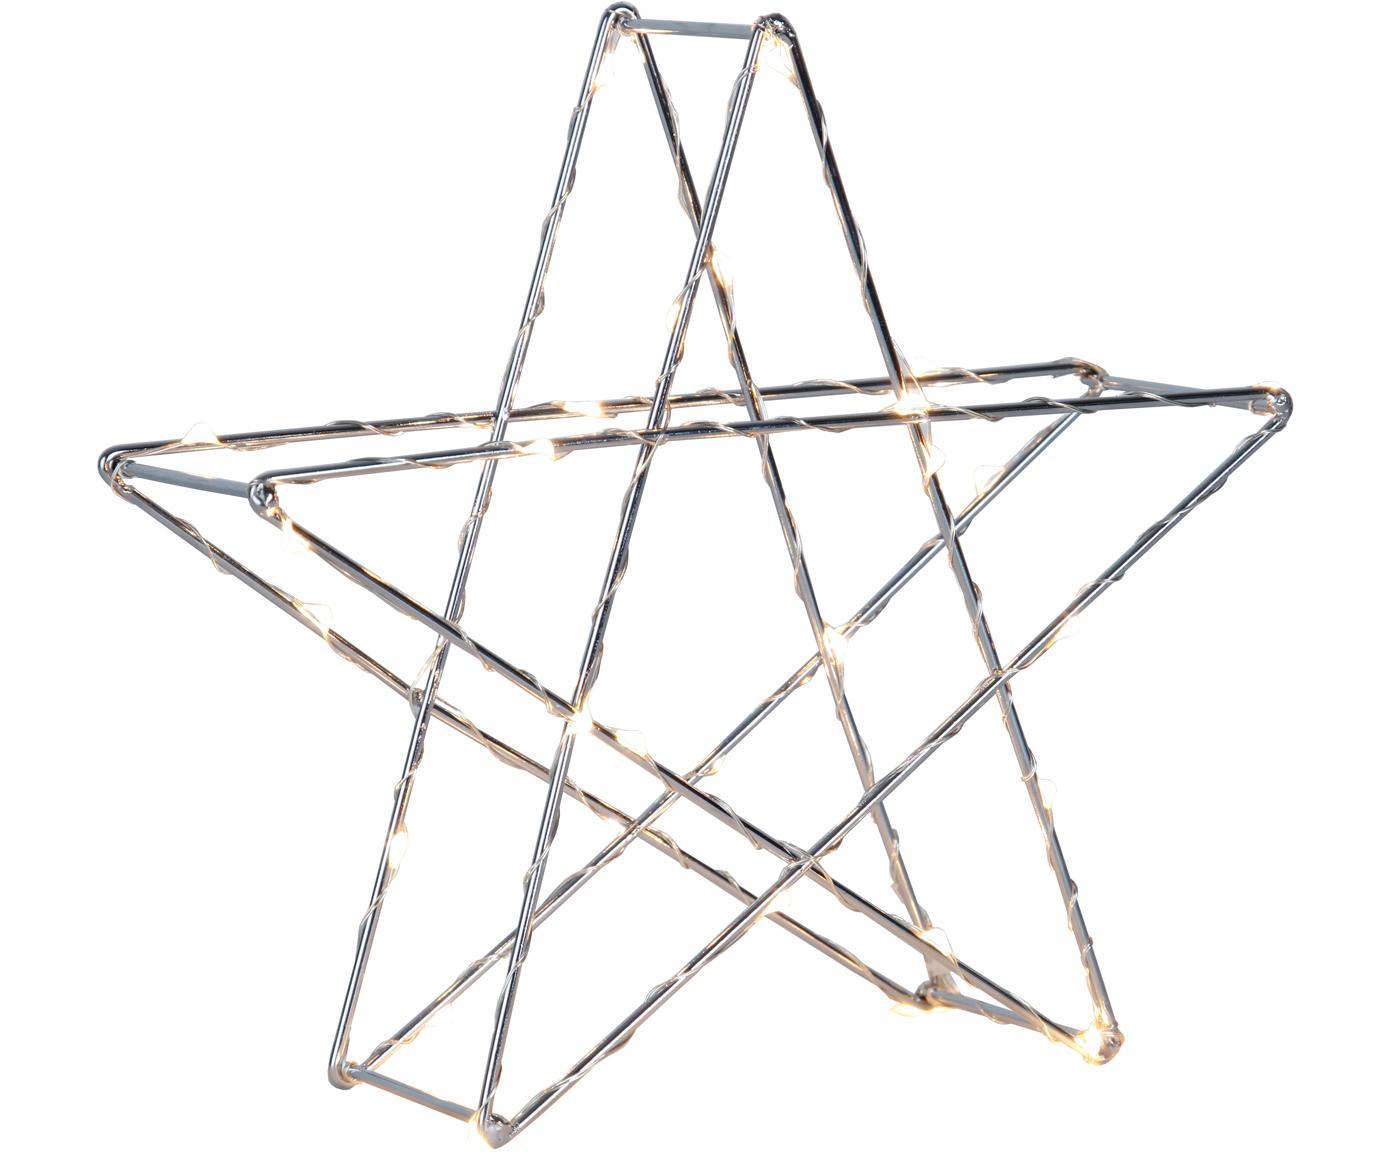 Lámpara decorativa LED a pilas Stern, Lámpara: metal, Cable: plástico, Cromo, An 25 x Al 25 cm